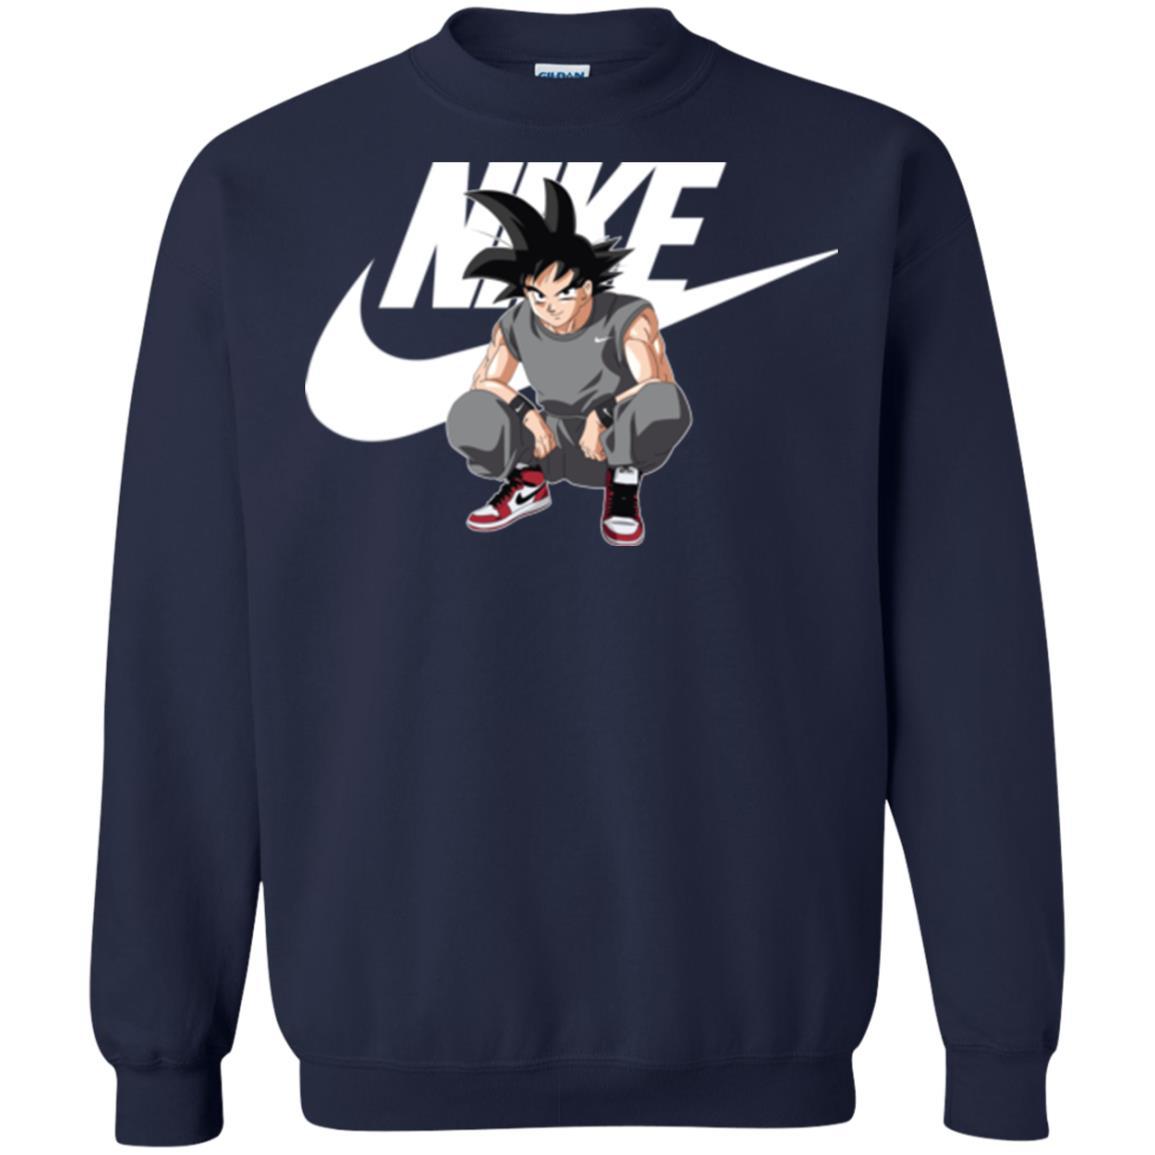 image 257px Songoku Nike Mashup T Shirt, Hoodies, Tank Top